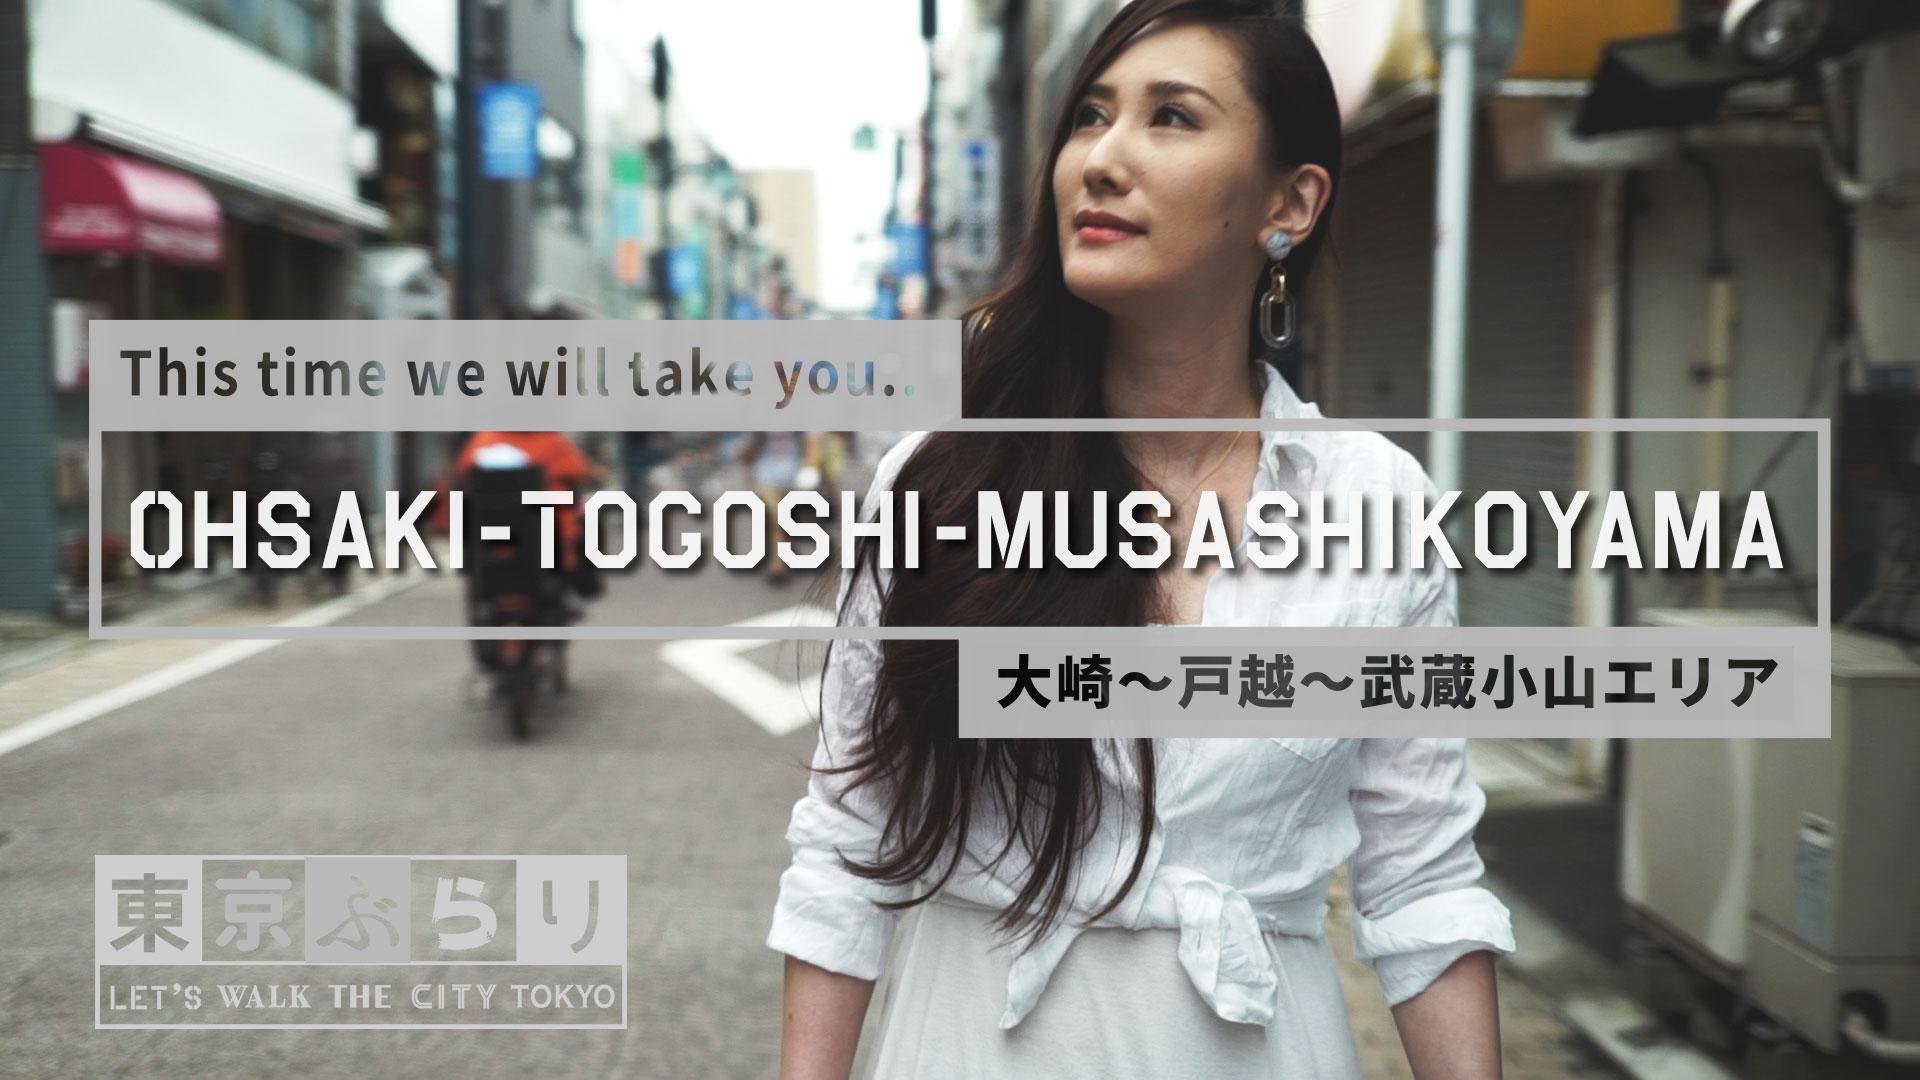 Ohsaki-Togoshi-Musashikoyama(大崎-戸越-武蔵小山)| TokyoBurari東京ぶらり[Let's Walk The City TOKYO!]Vol.31